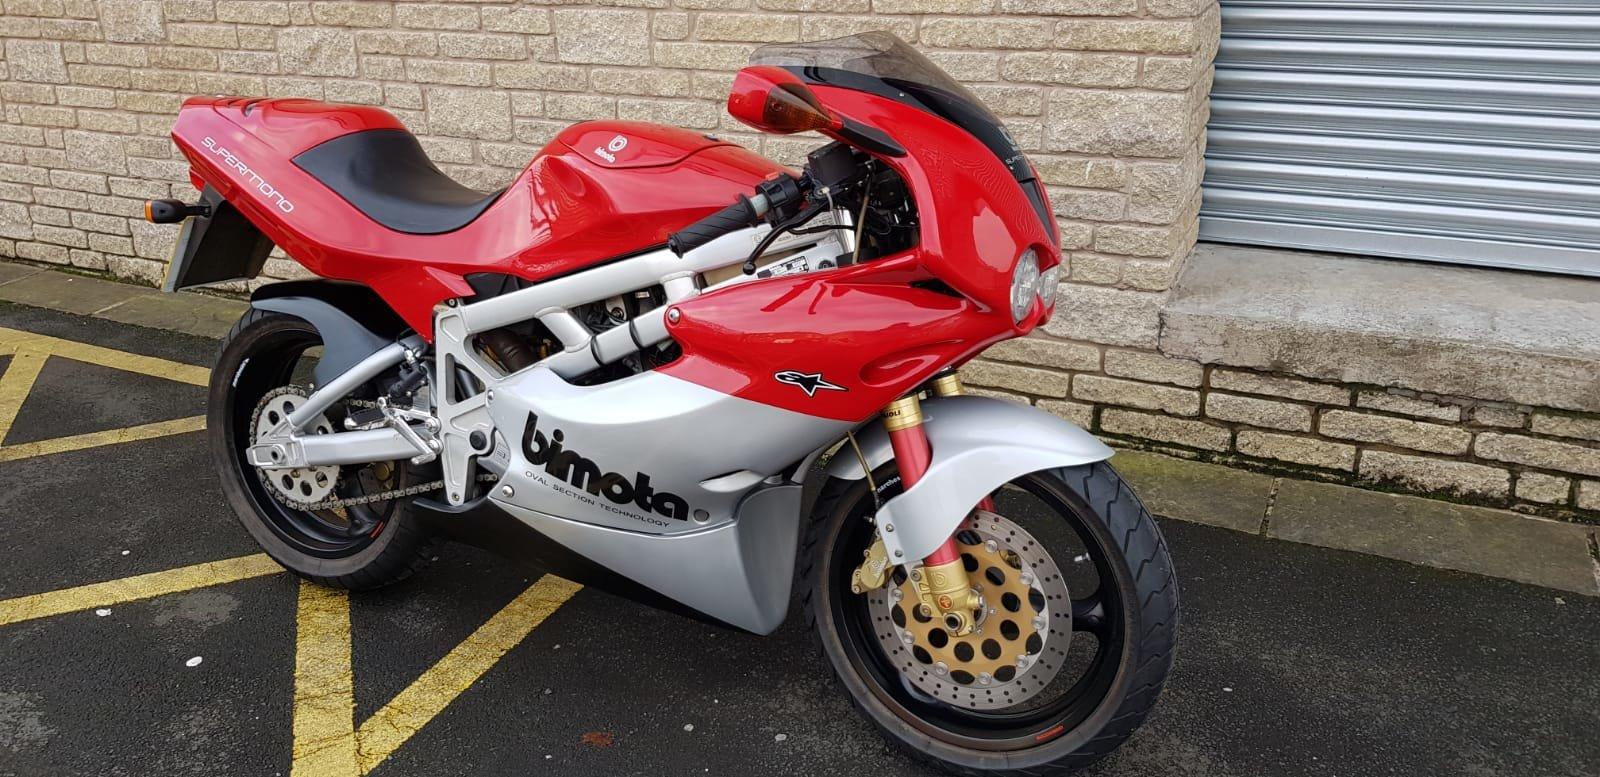 1997 Bimota Immaculate BB1 Supermono For Sale (picture 1 of 5)